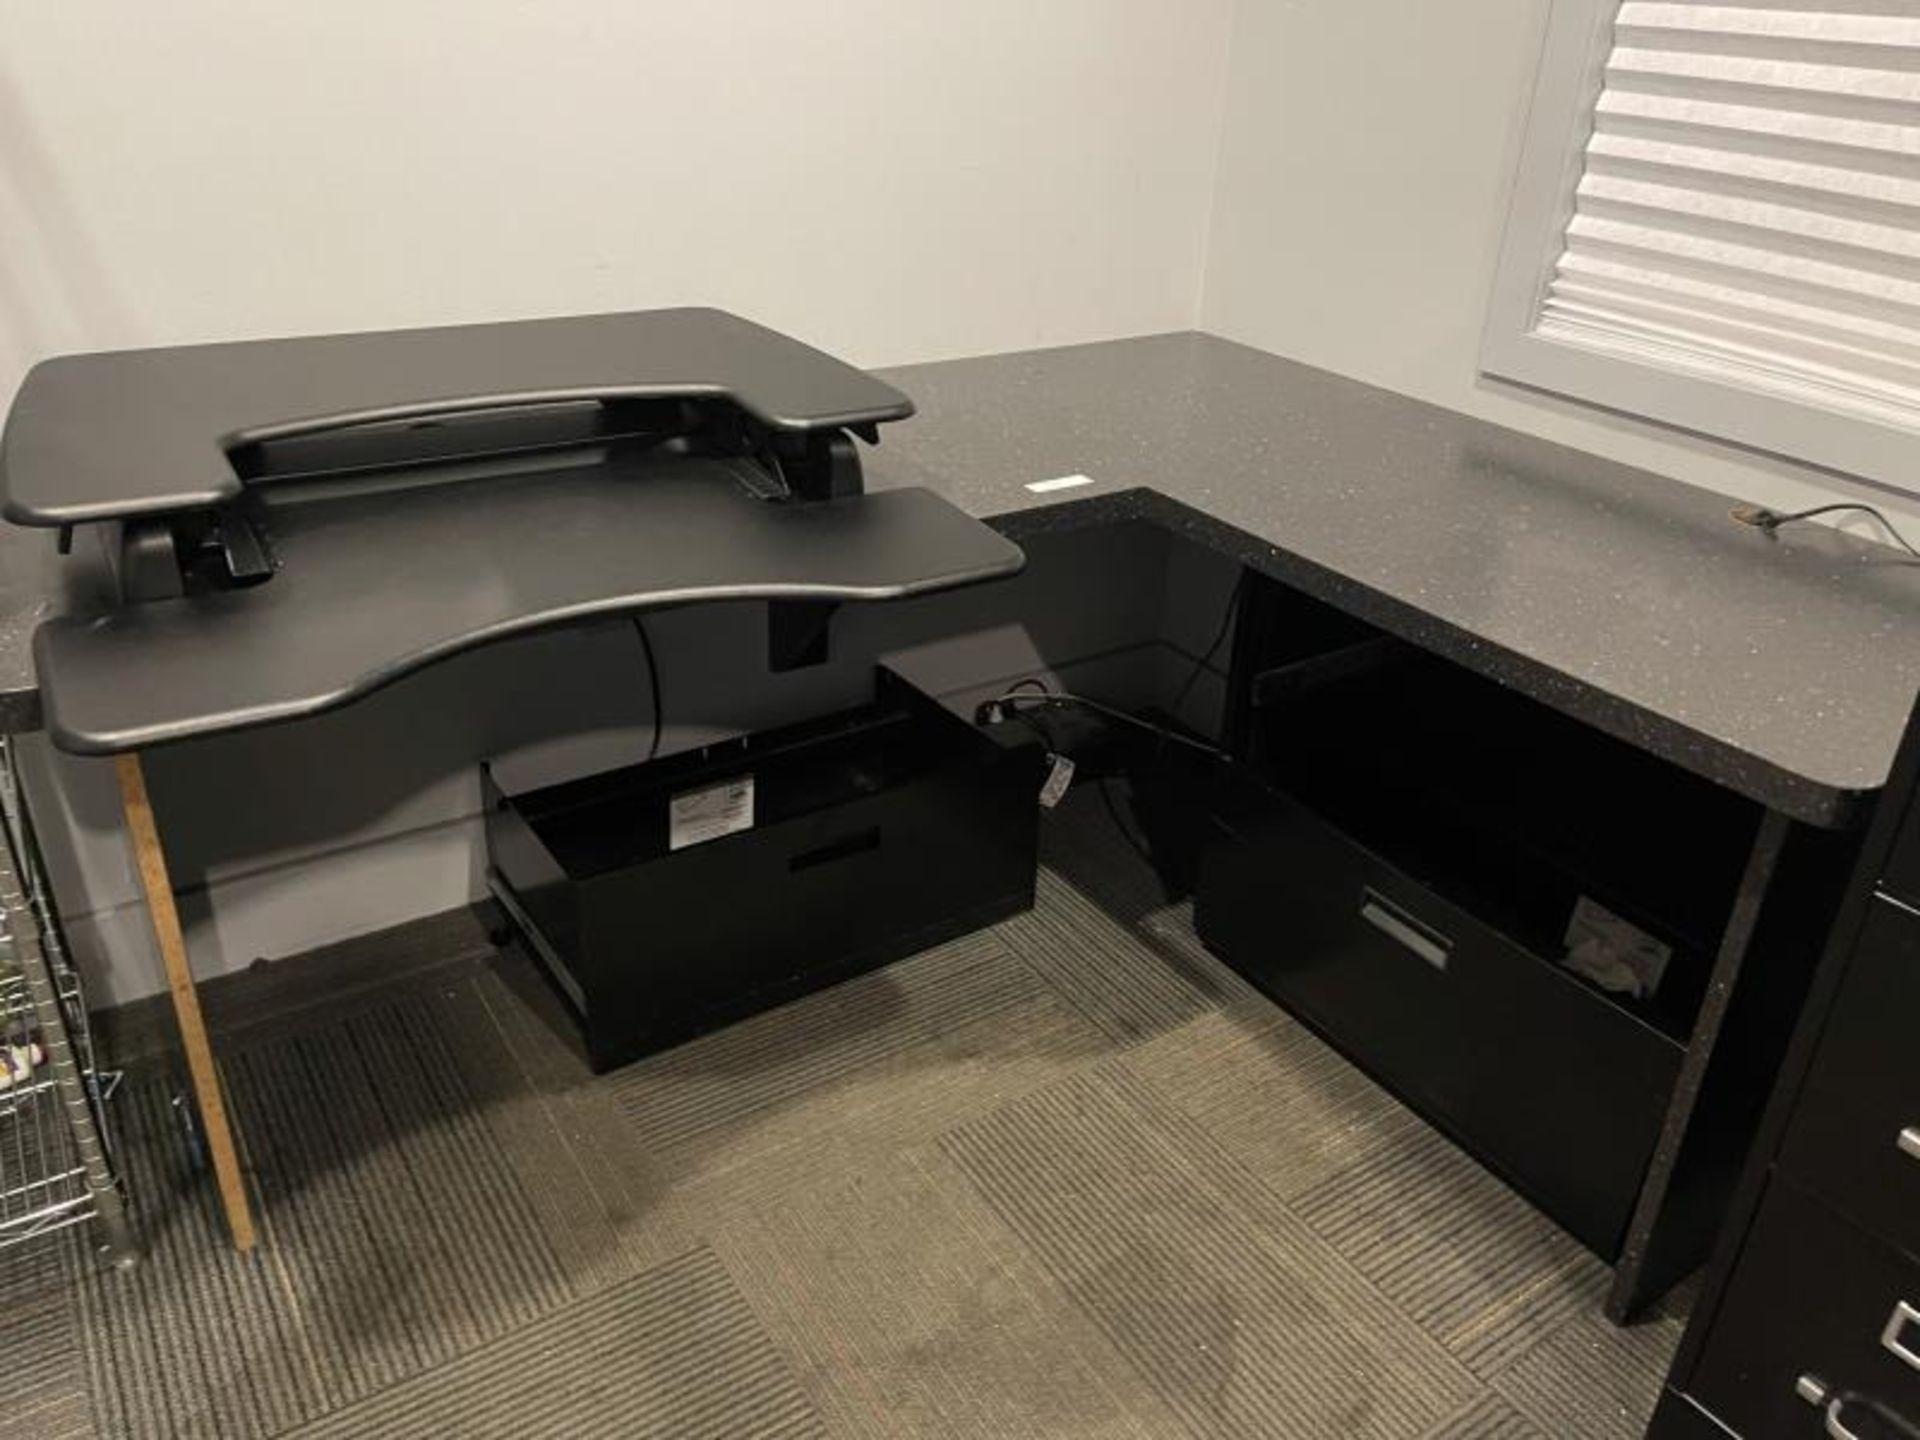 L-Shaped Laminate Desk with Varidesk ProPlus 360